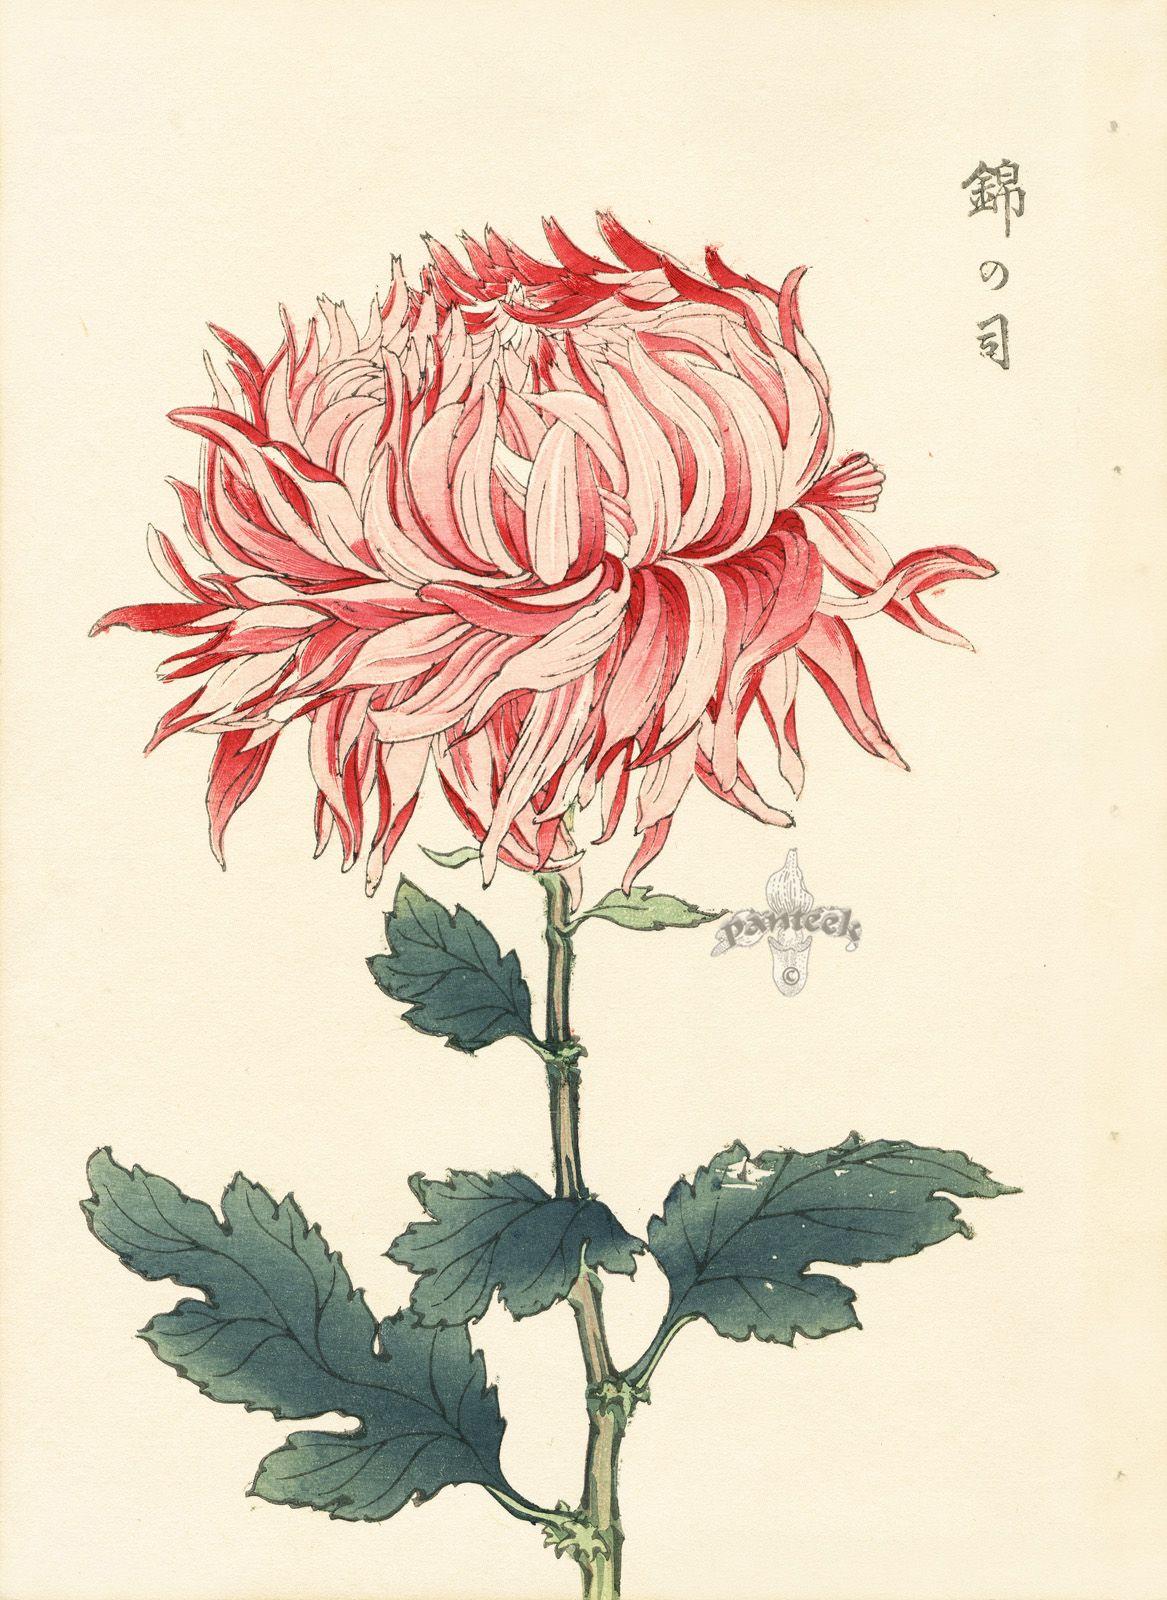 Pin By De Jay On Graphics Botanicals Botanical Drawings Japanese Woodblock Printing Japanese Chrysanthemum